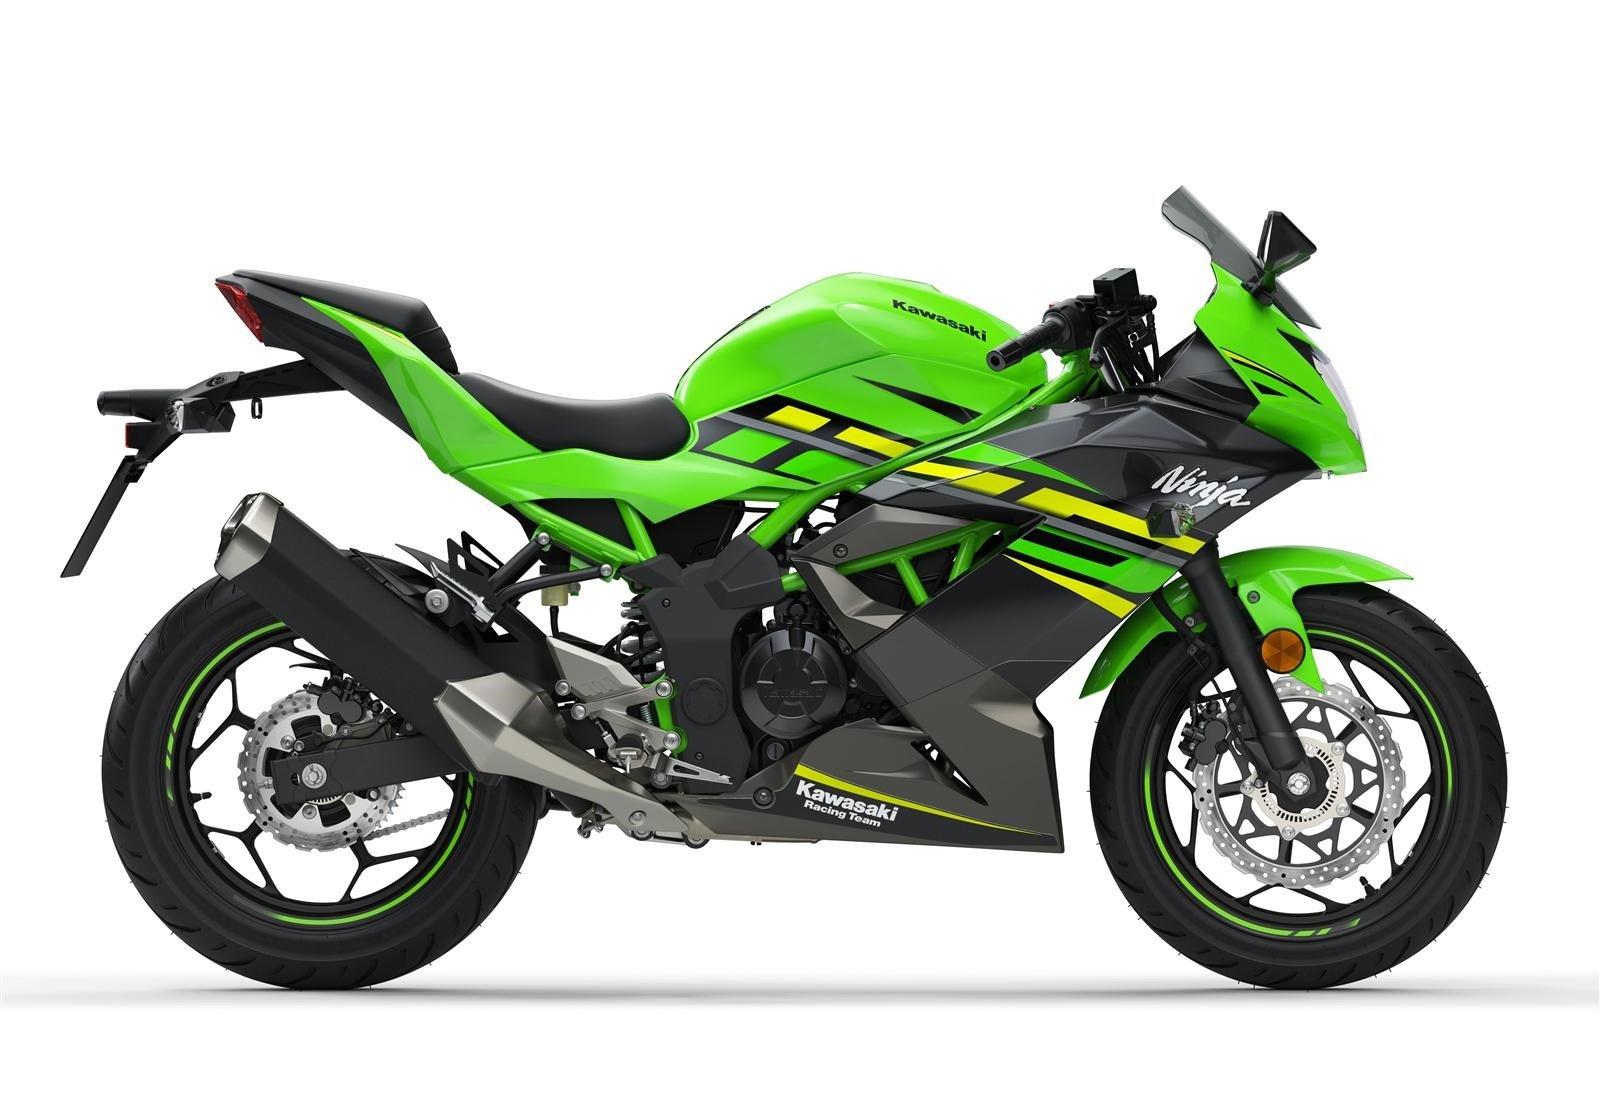 New 2019 Kawasaki Ninja 125 ABS KRT**SAVE £800!!** For Sale (picture 2 of 6)